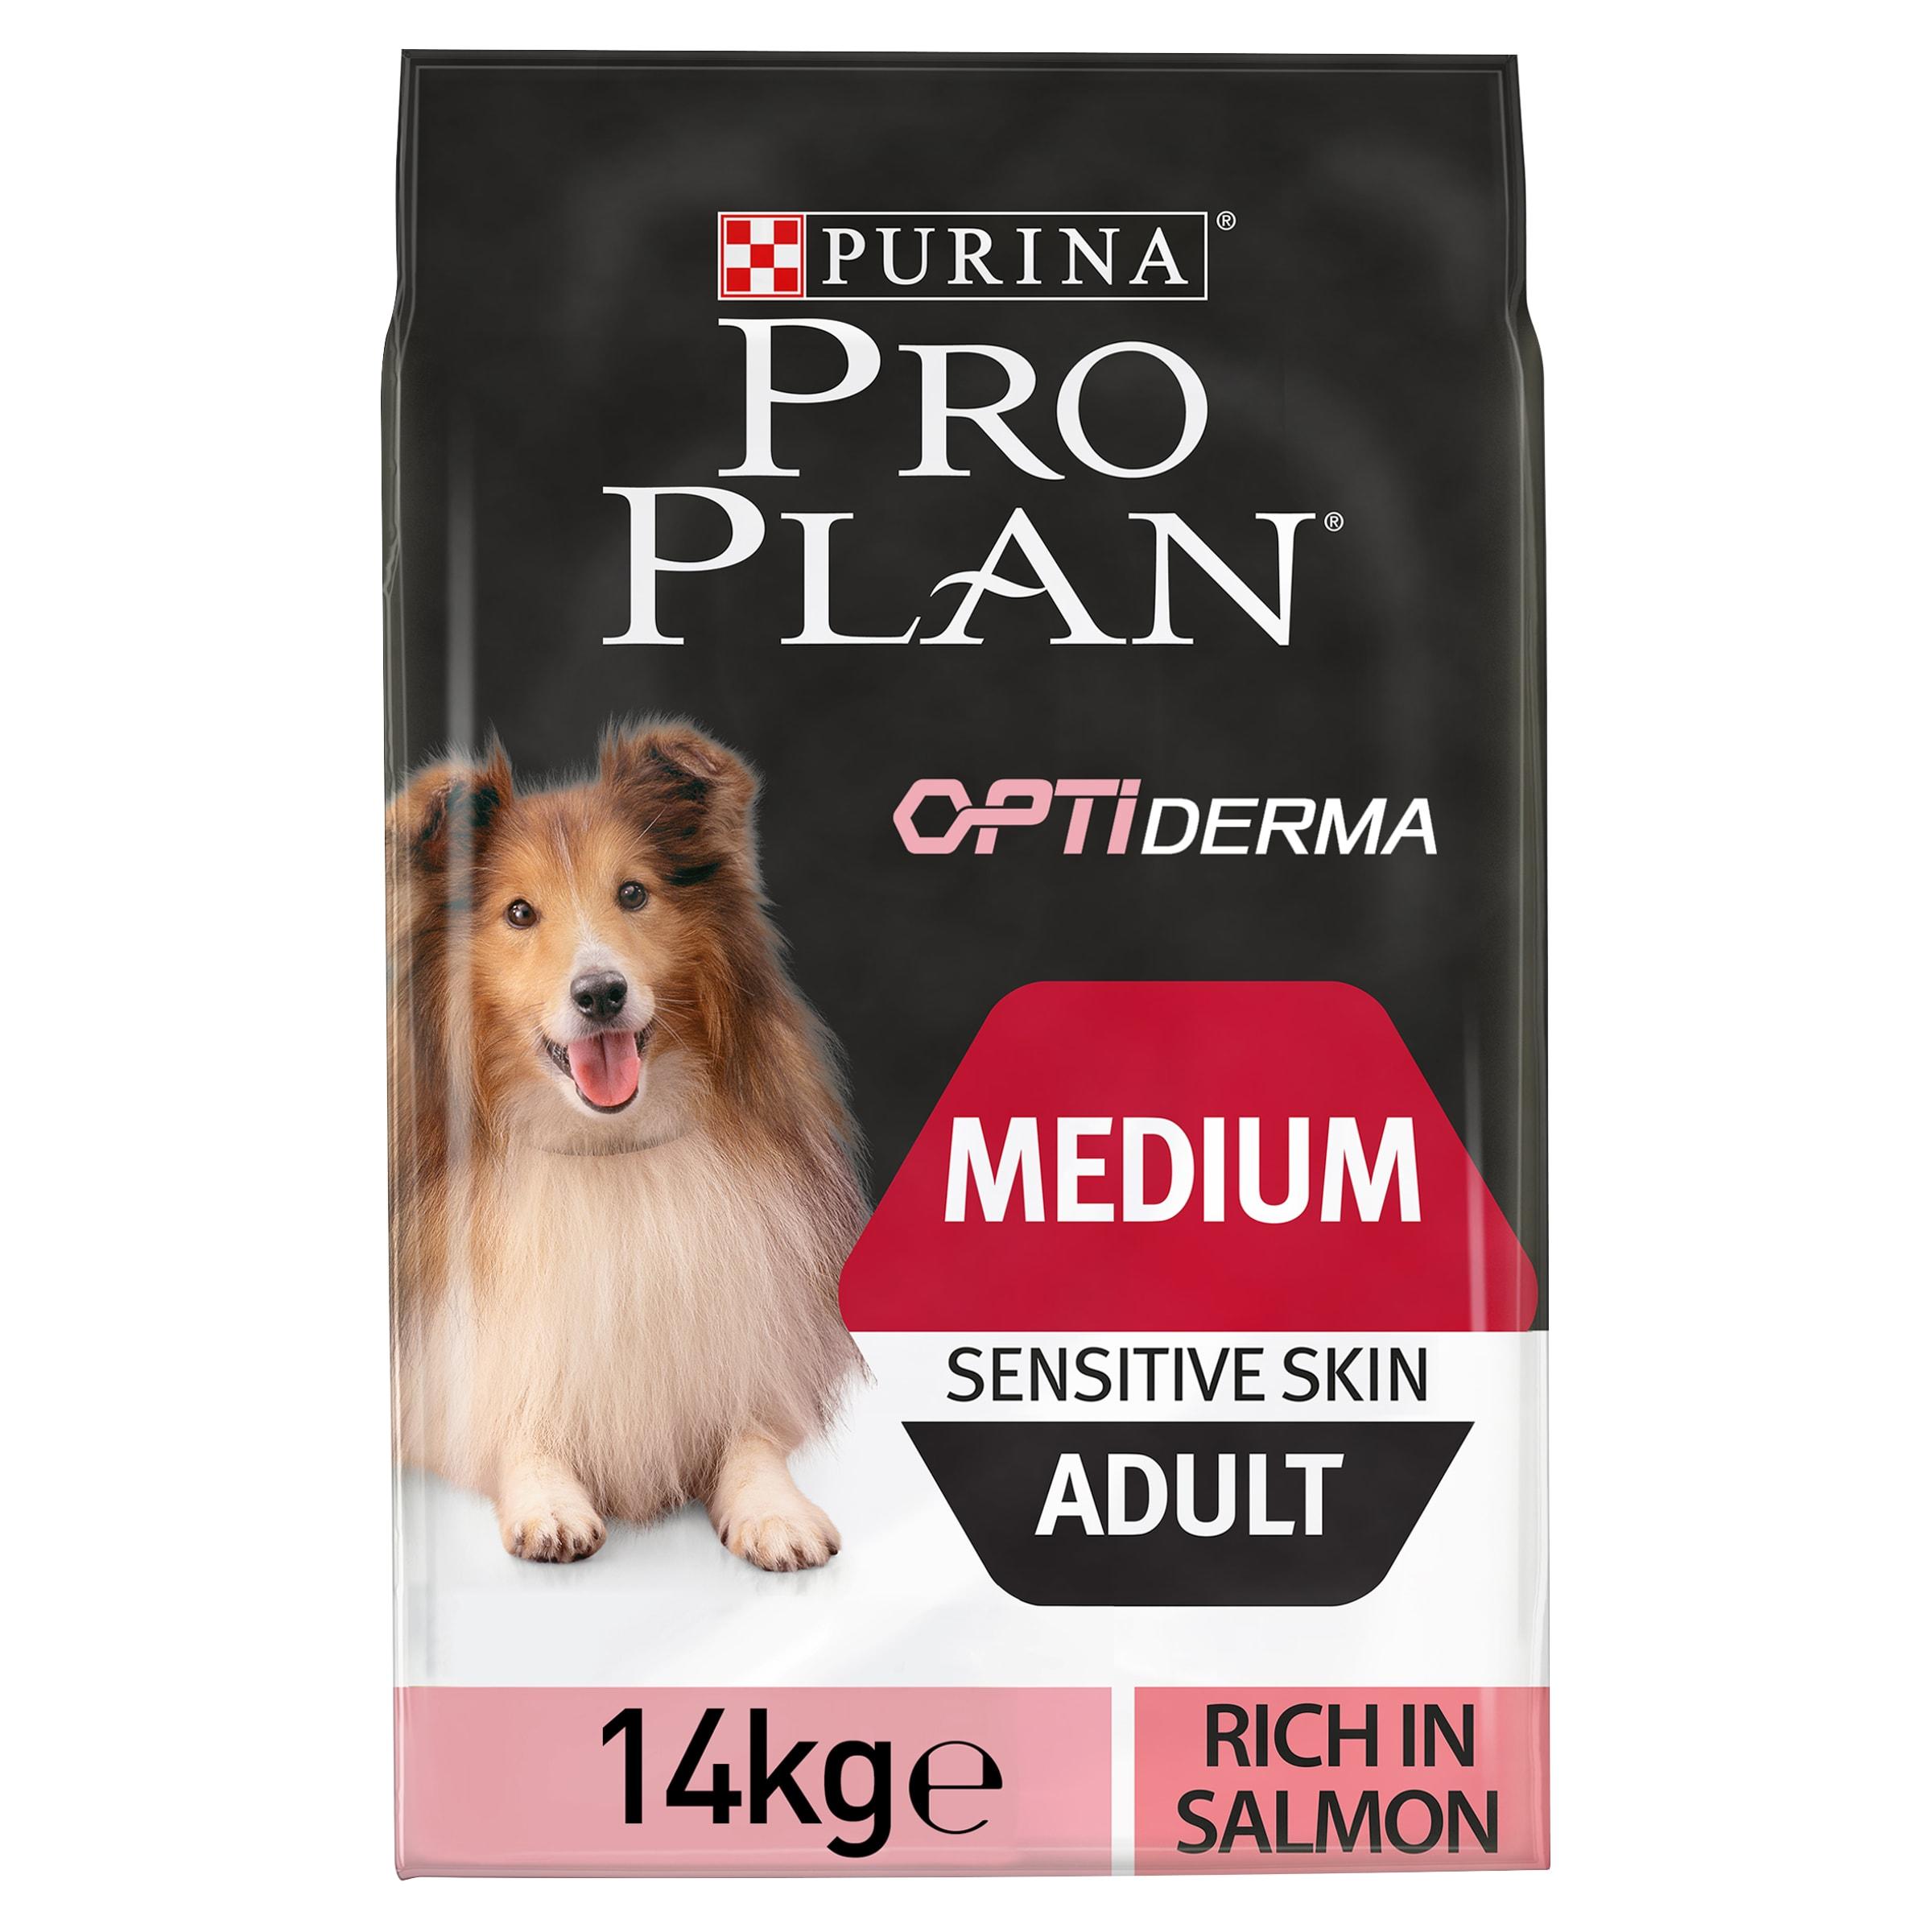 purina pro plan medium adult dog sensitive. Black Bedroom Furniture Sets. Home Design Ideas